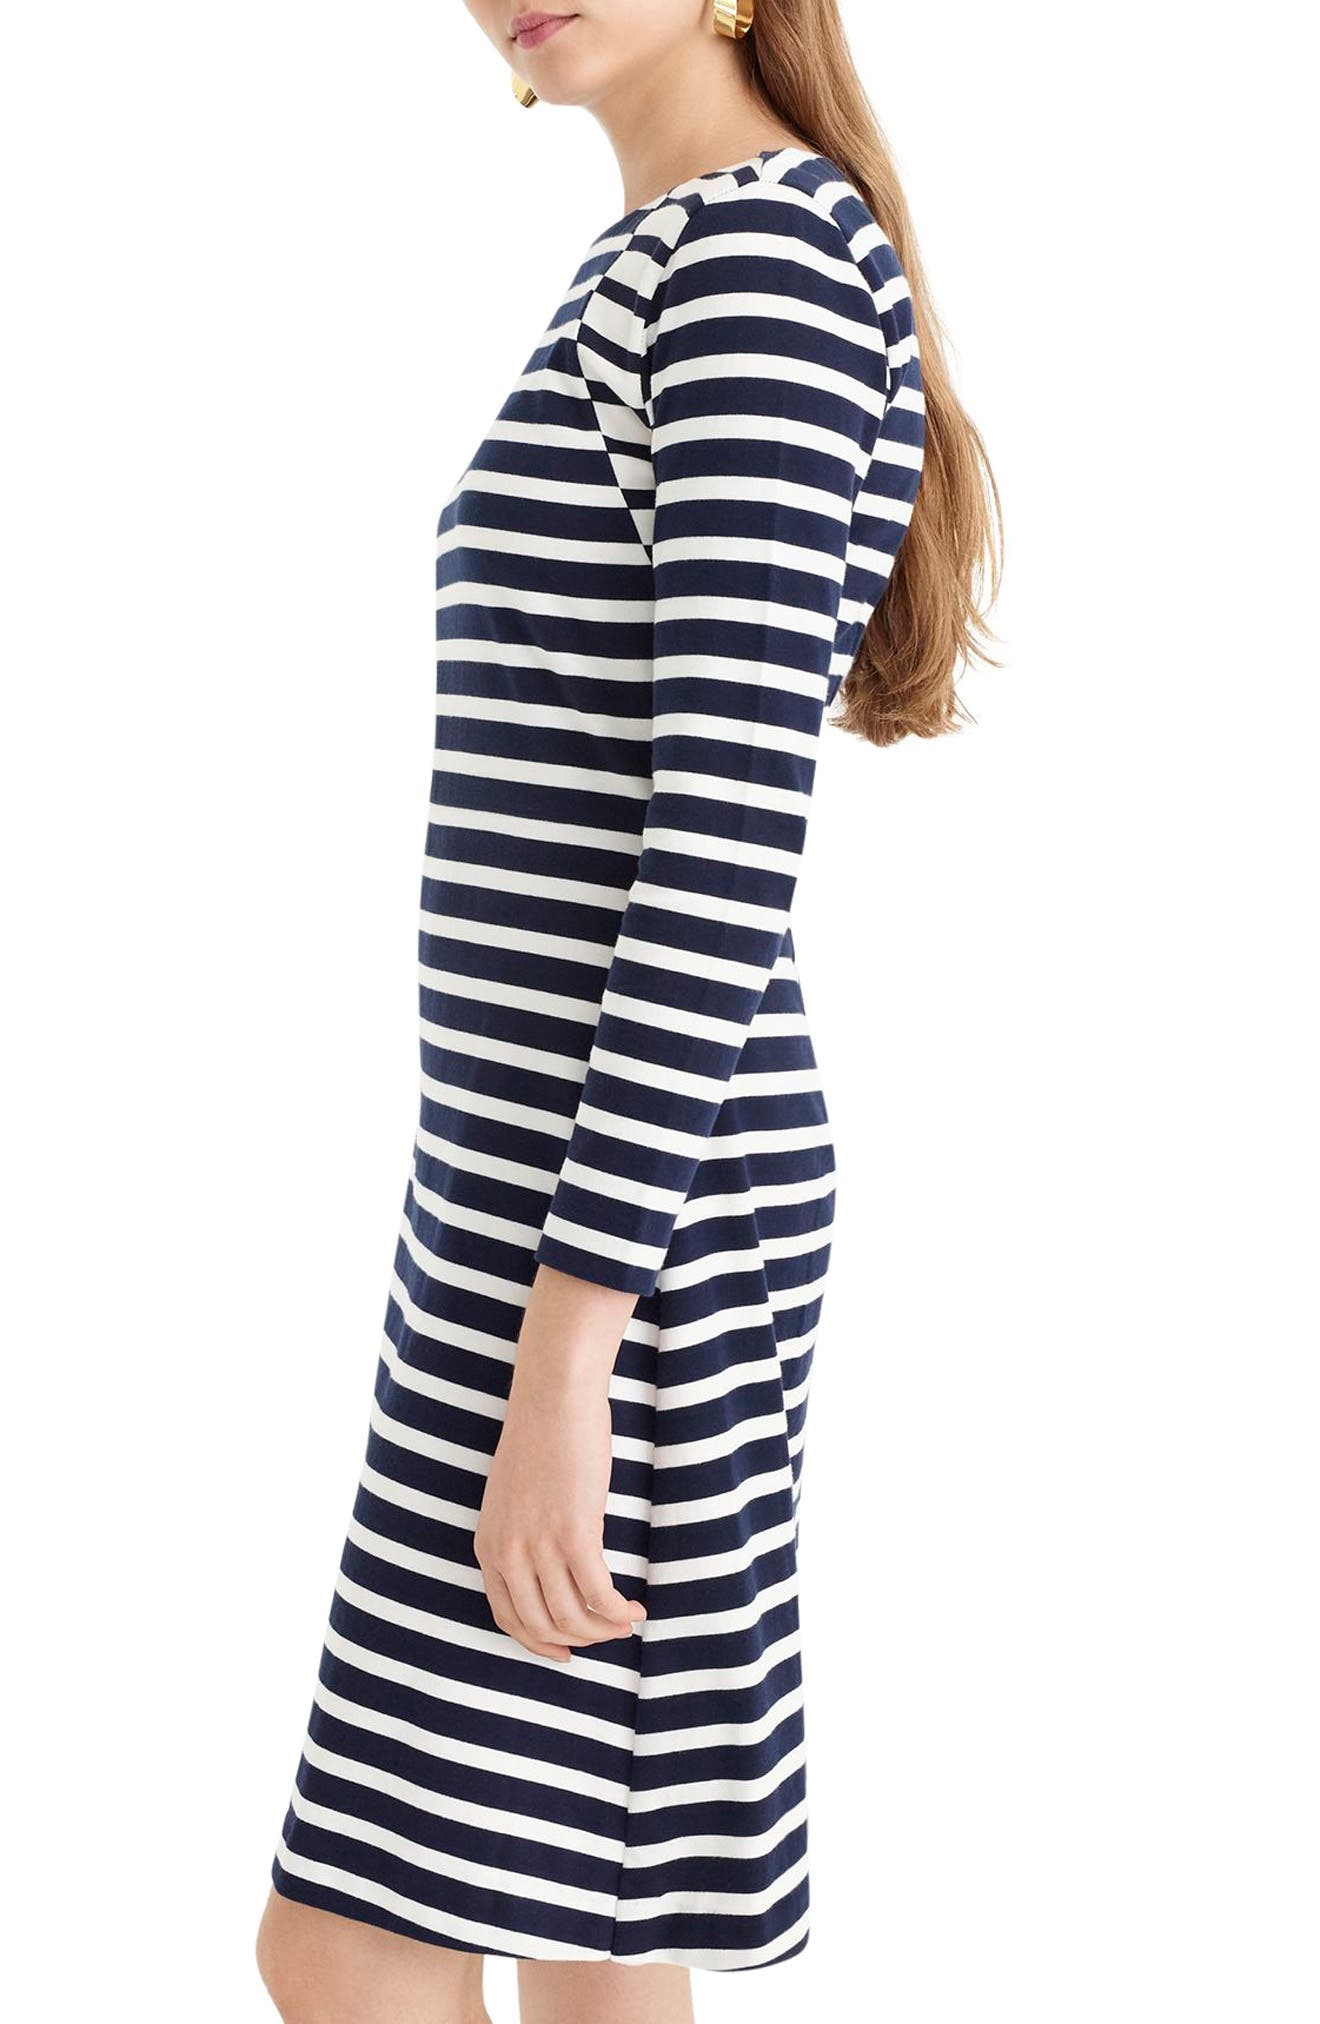 365 Stripe Knit Fit & Flare Dress,                             Alternate thumbnail 3, color,                             400